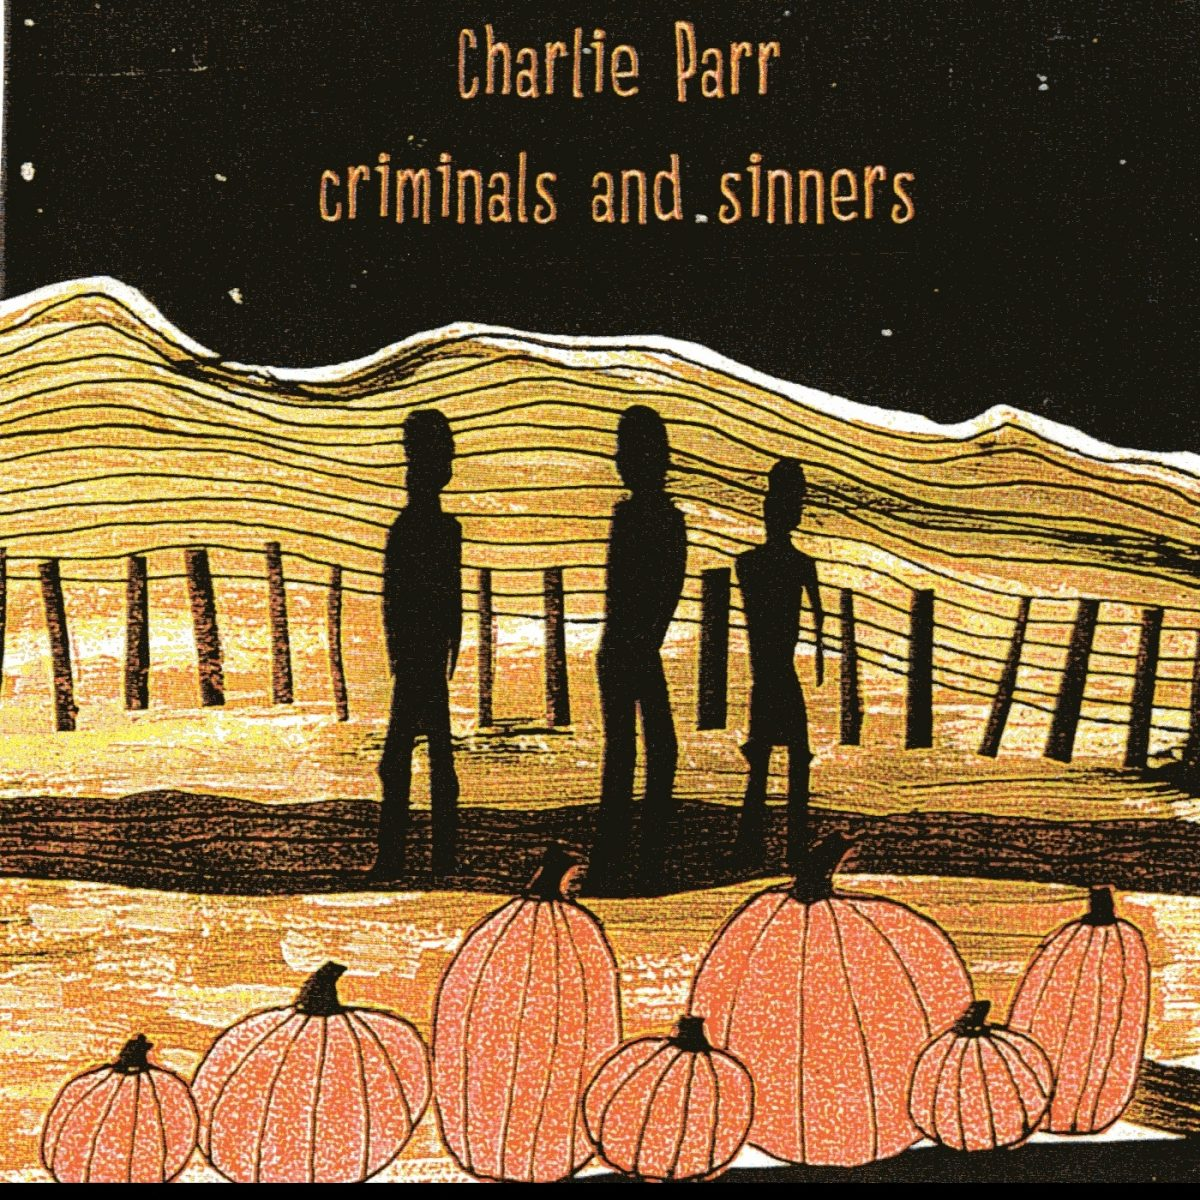 Charlie Parr - Criminals and Sinners Album Art